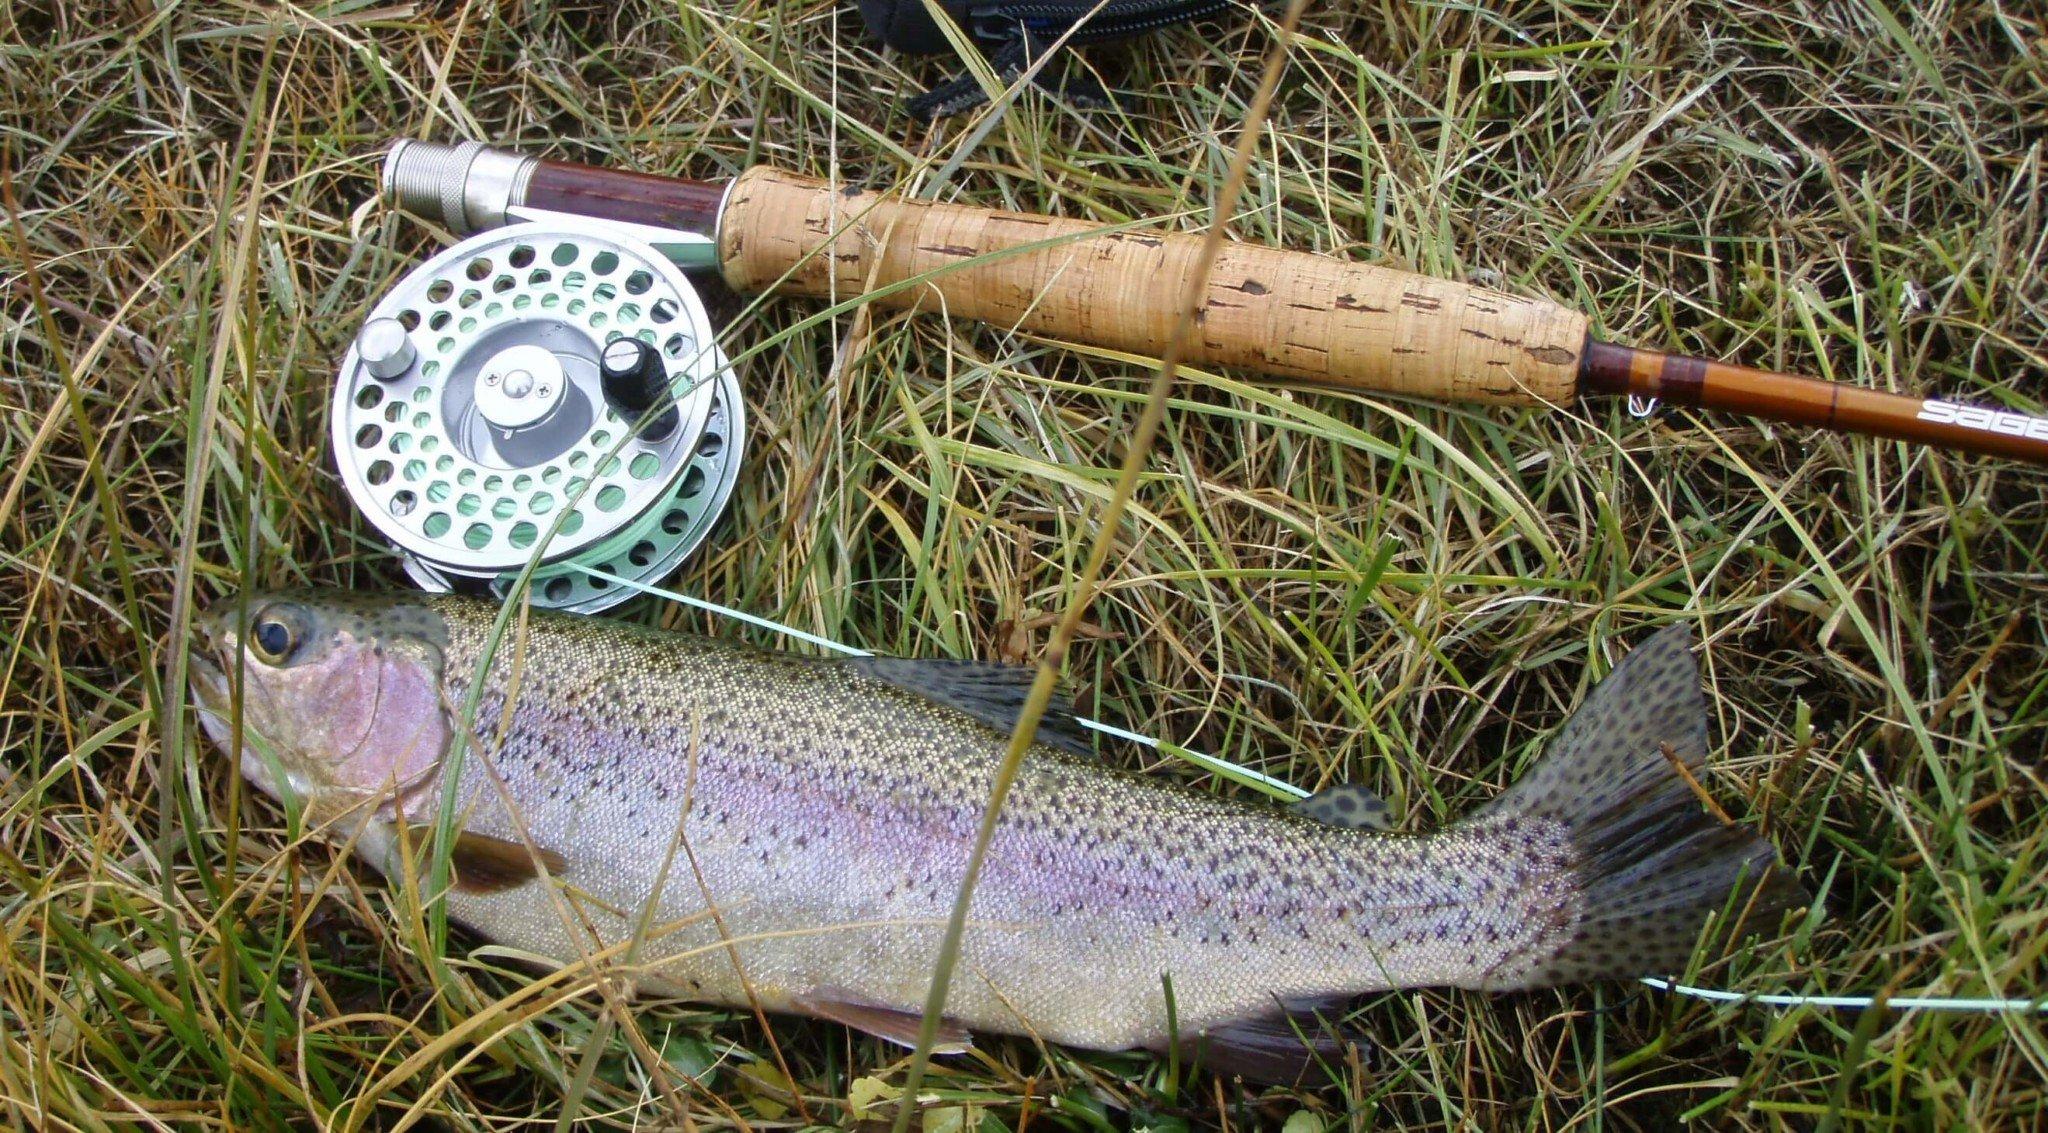 rainbow-trout-609551